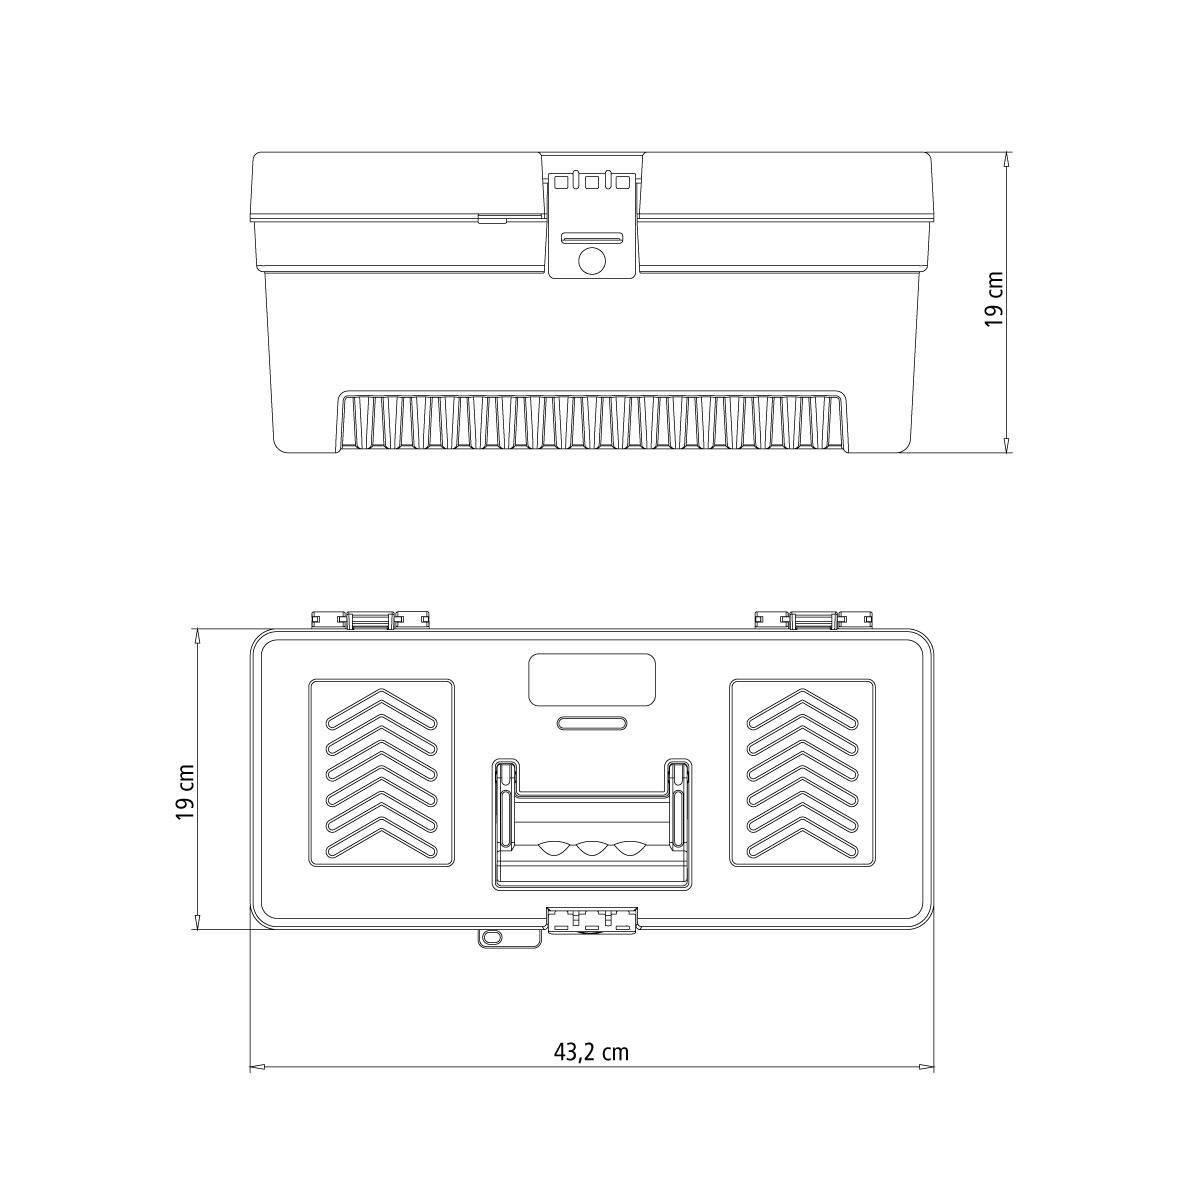 Caixa Plástica de Ferramentas Tramontina 43804/117 17